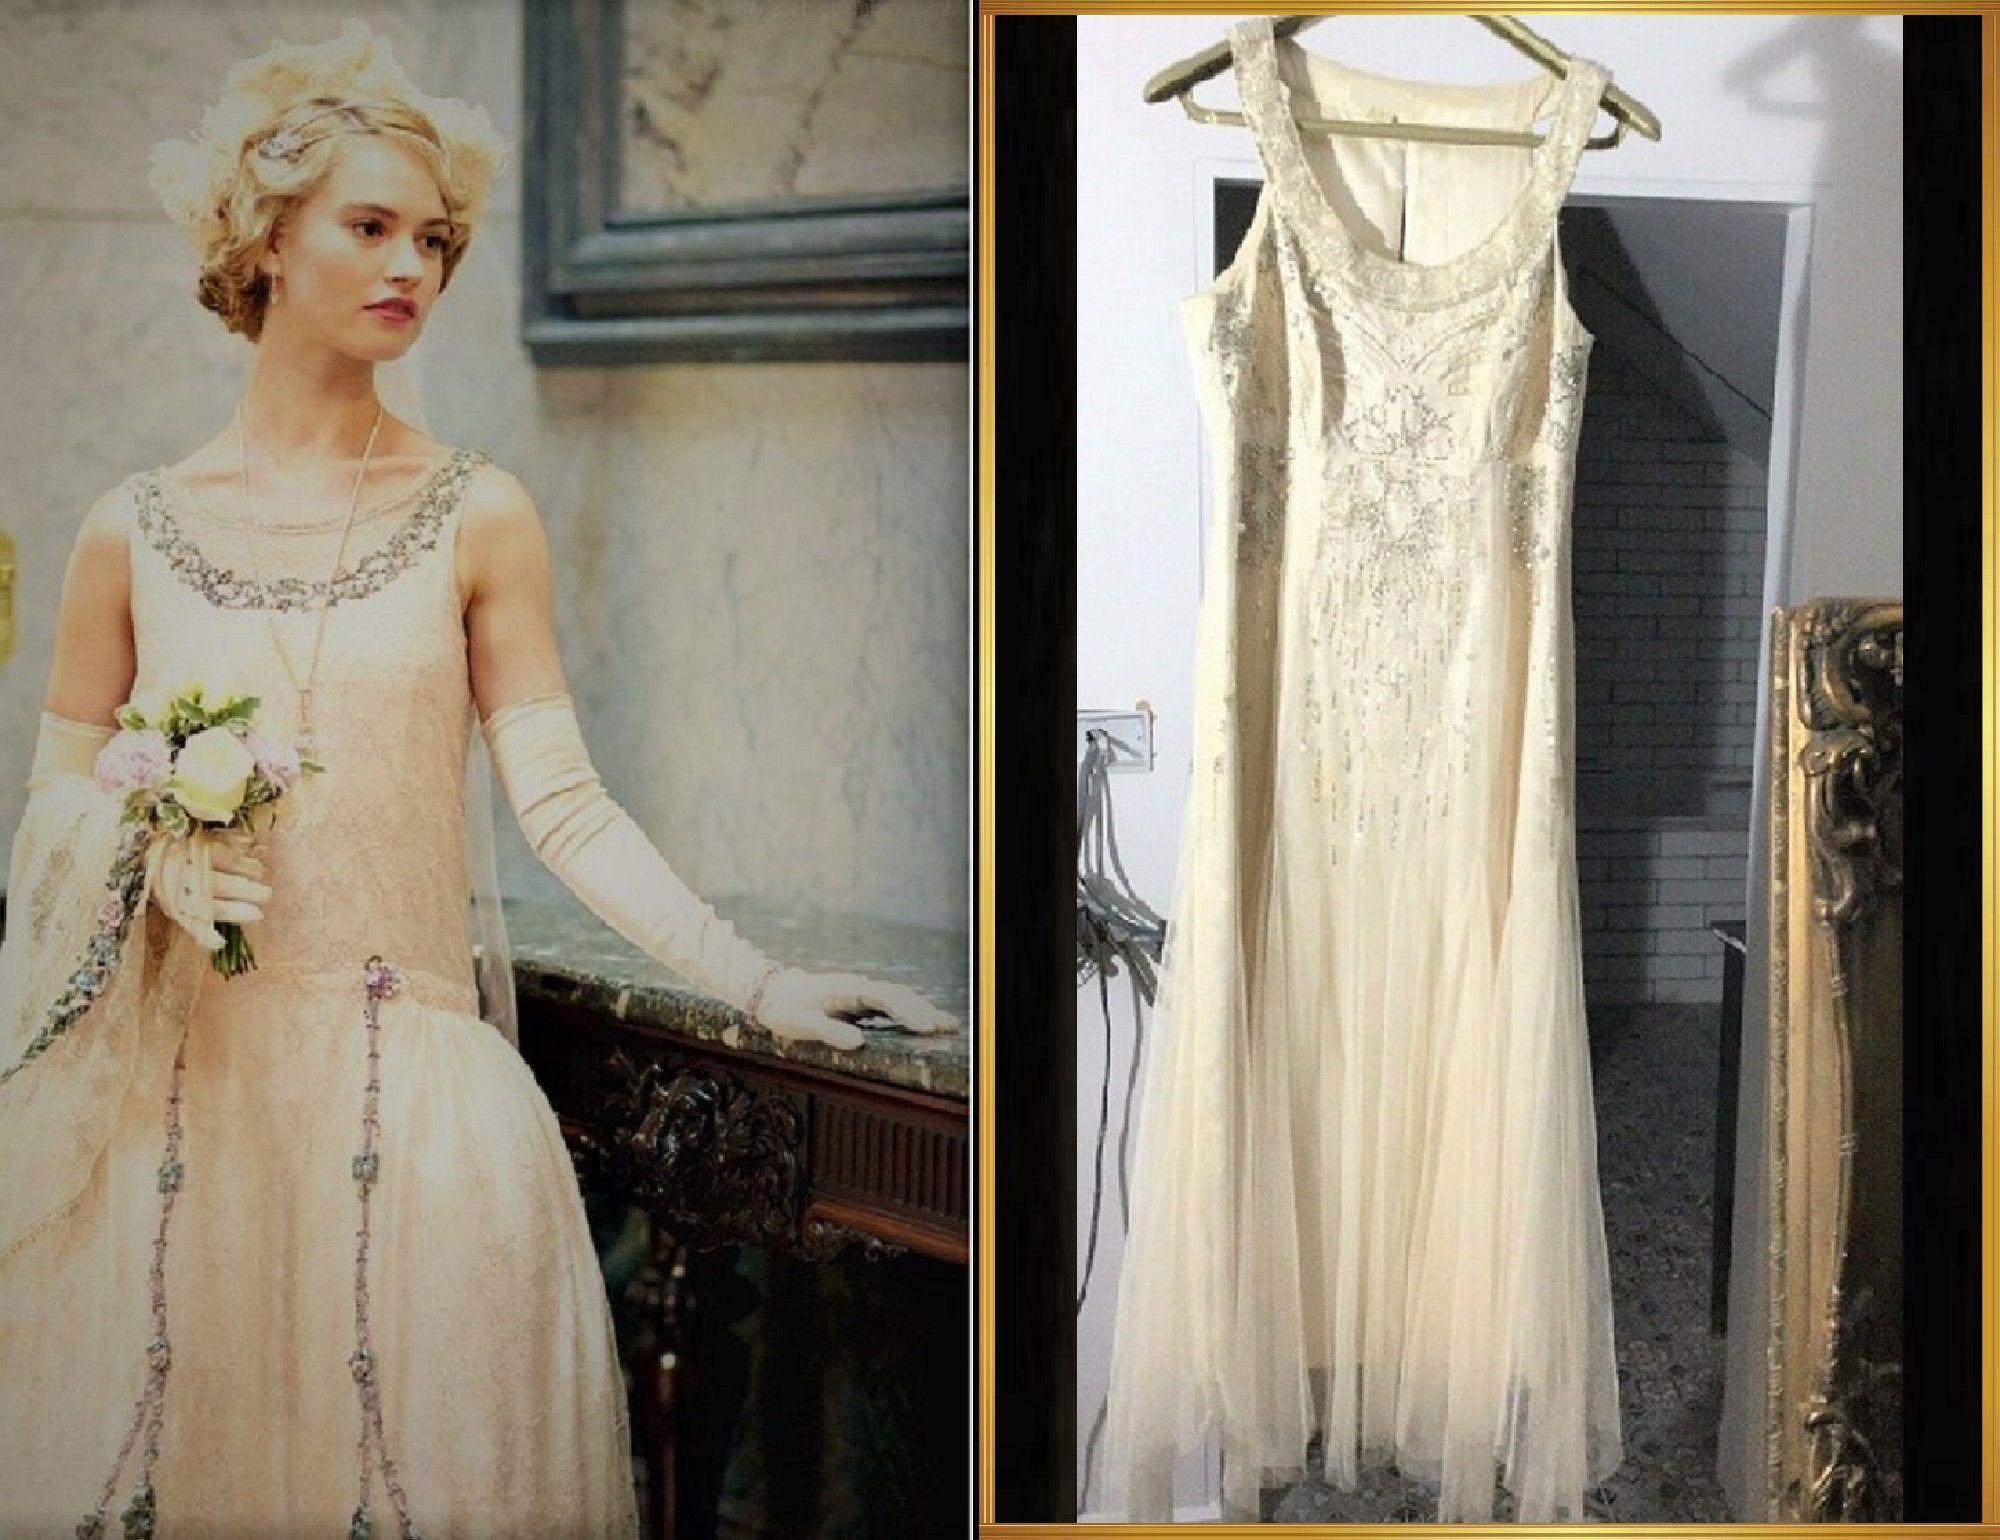 Flapper Wedding Dress Vintage Wedding Dress 1920s Style Etsy Flapper Wedding Dresses 1920s Wedding Dress 1920s Style Wedding Dresses